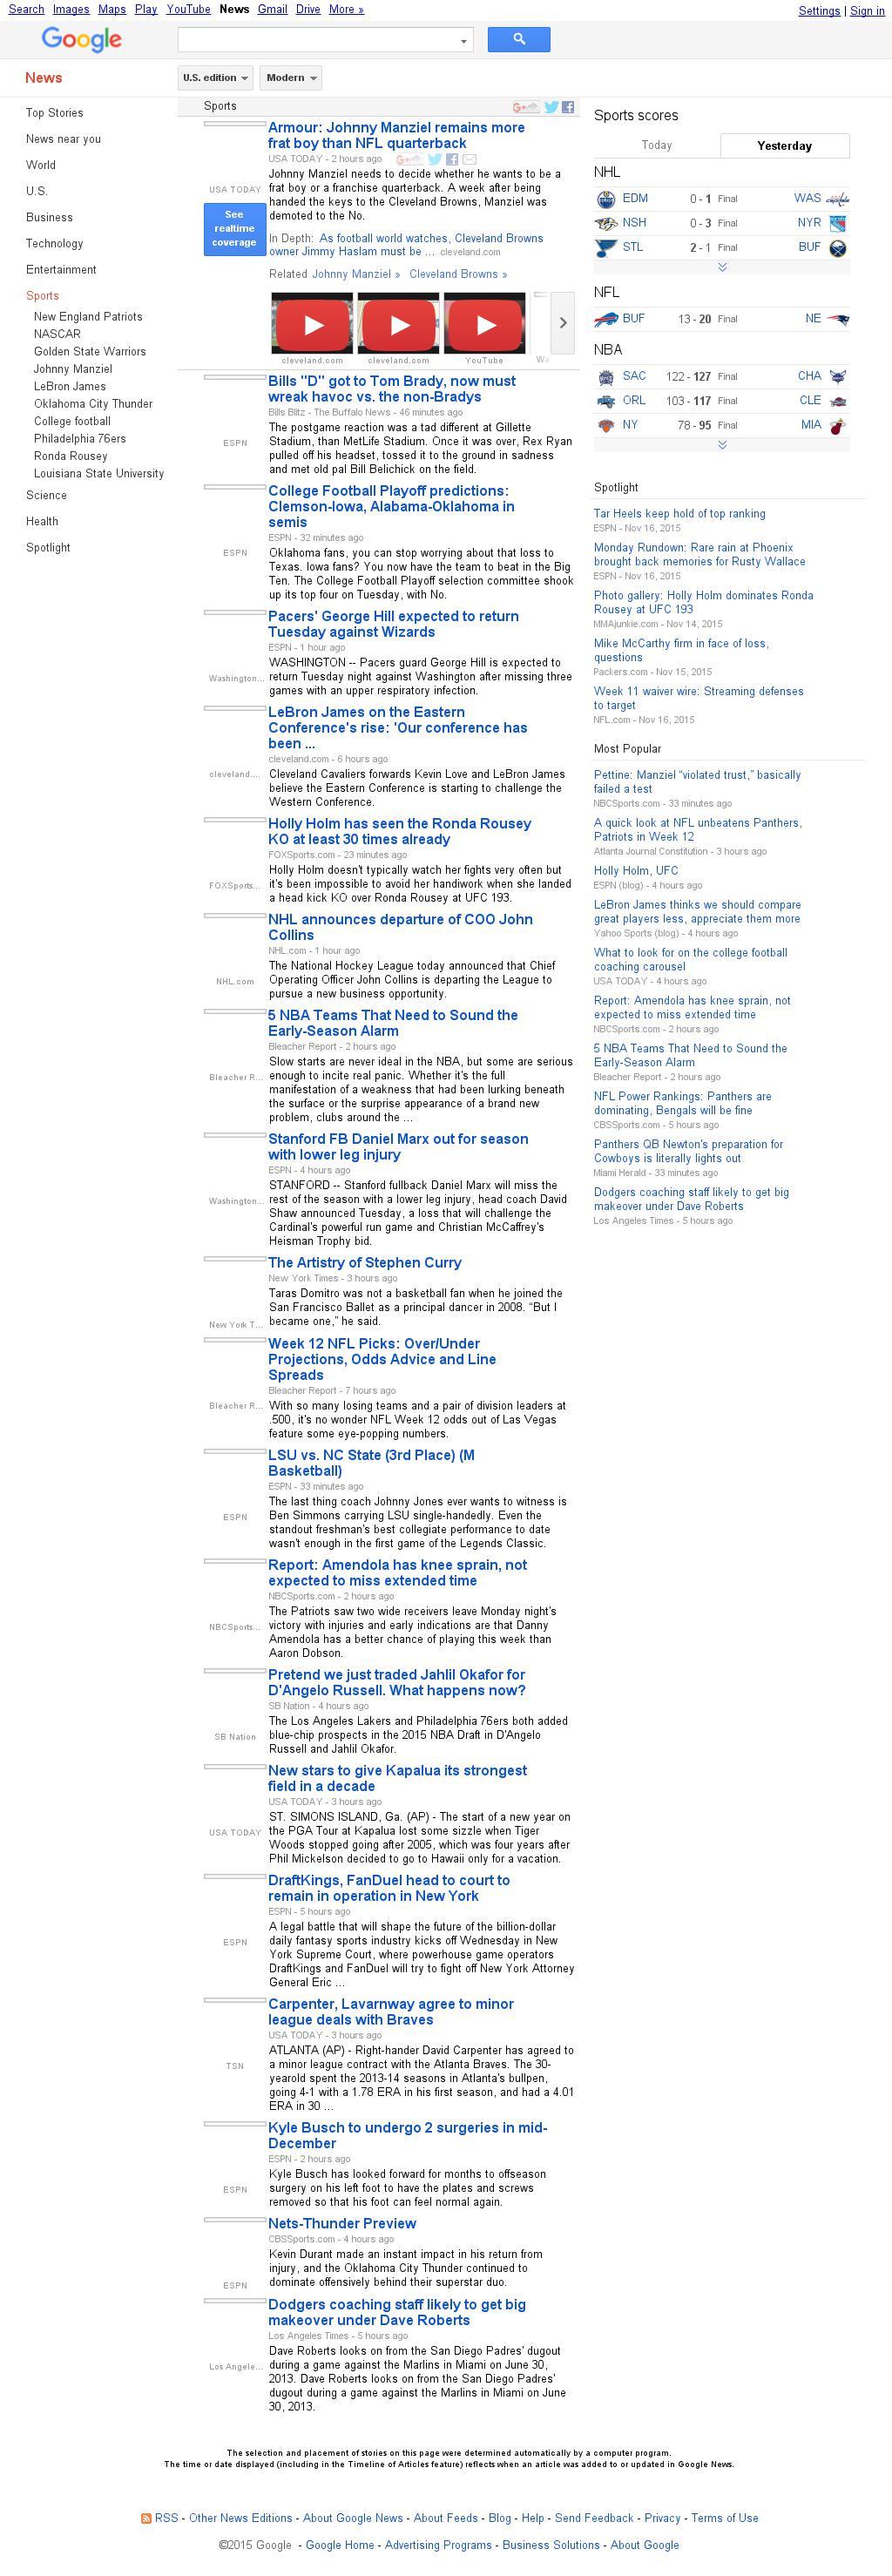 Google News: Sports at Wednesday Nov. 25, 2015, 1:08 a.m. UTC